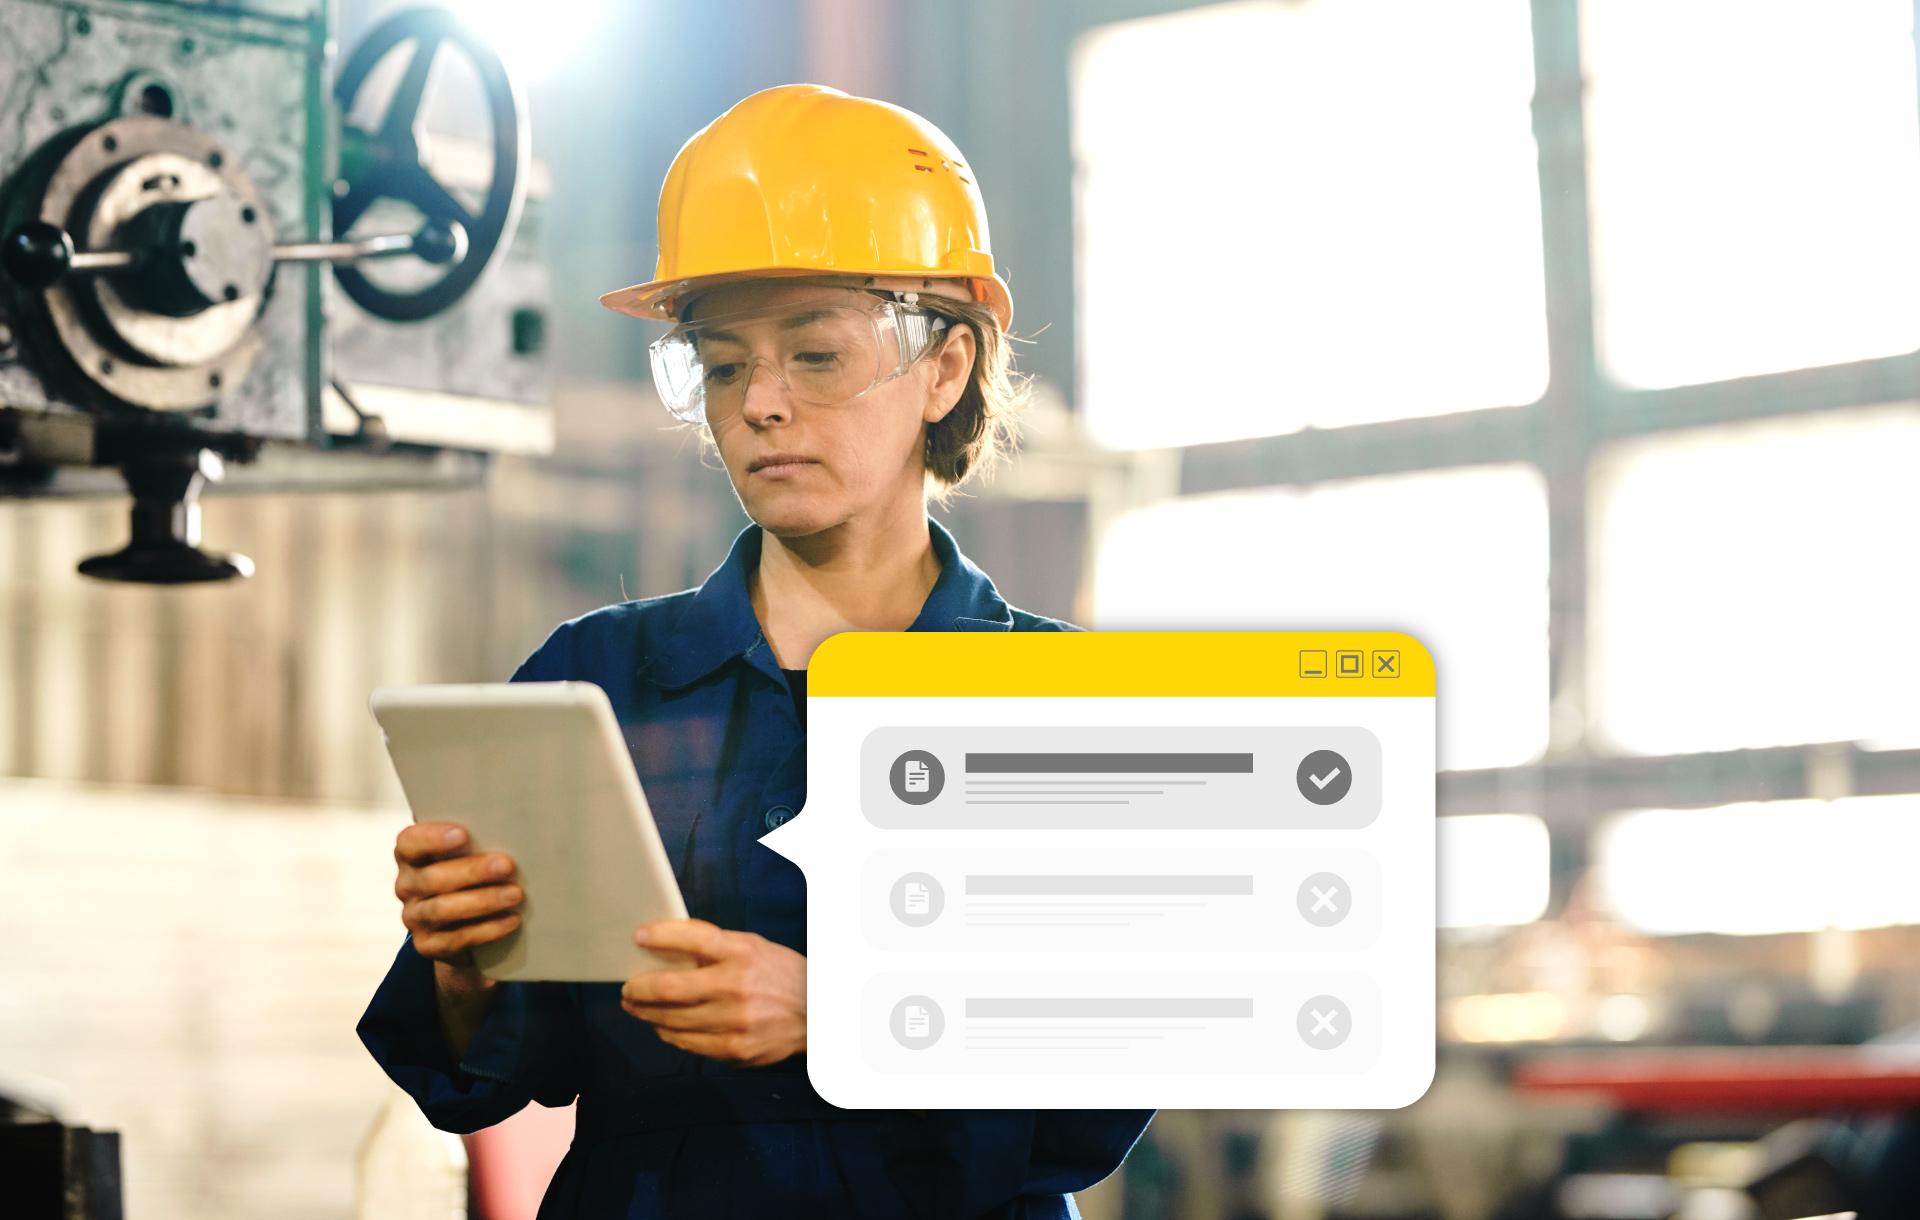 Essential-Manufacturing-ERP-Modules-Document-Control-Proximity-Delmia-Works